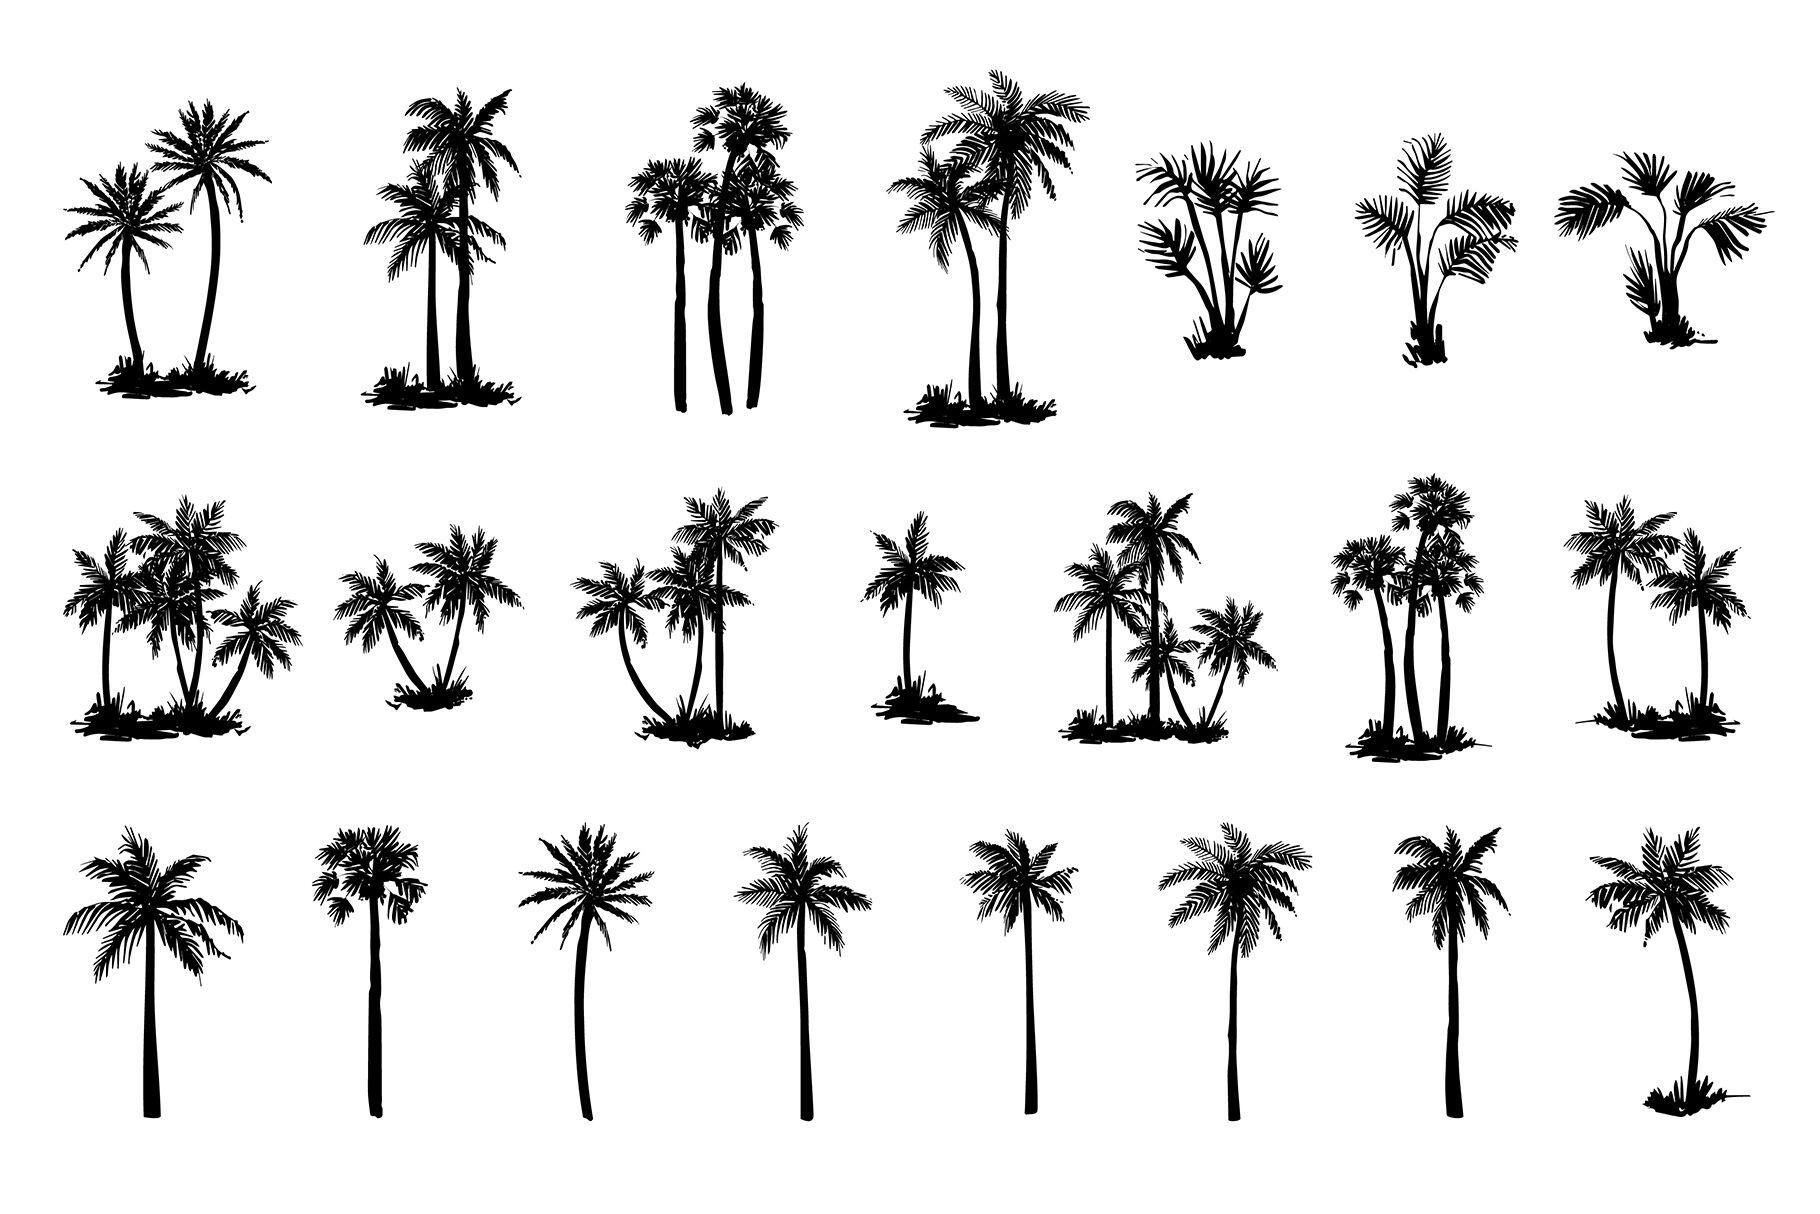 Hand Drawn Palm Tree Set By Artha Graphic Design Studio